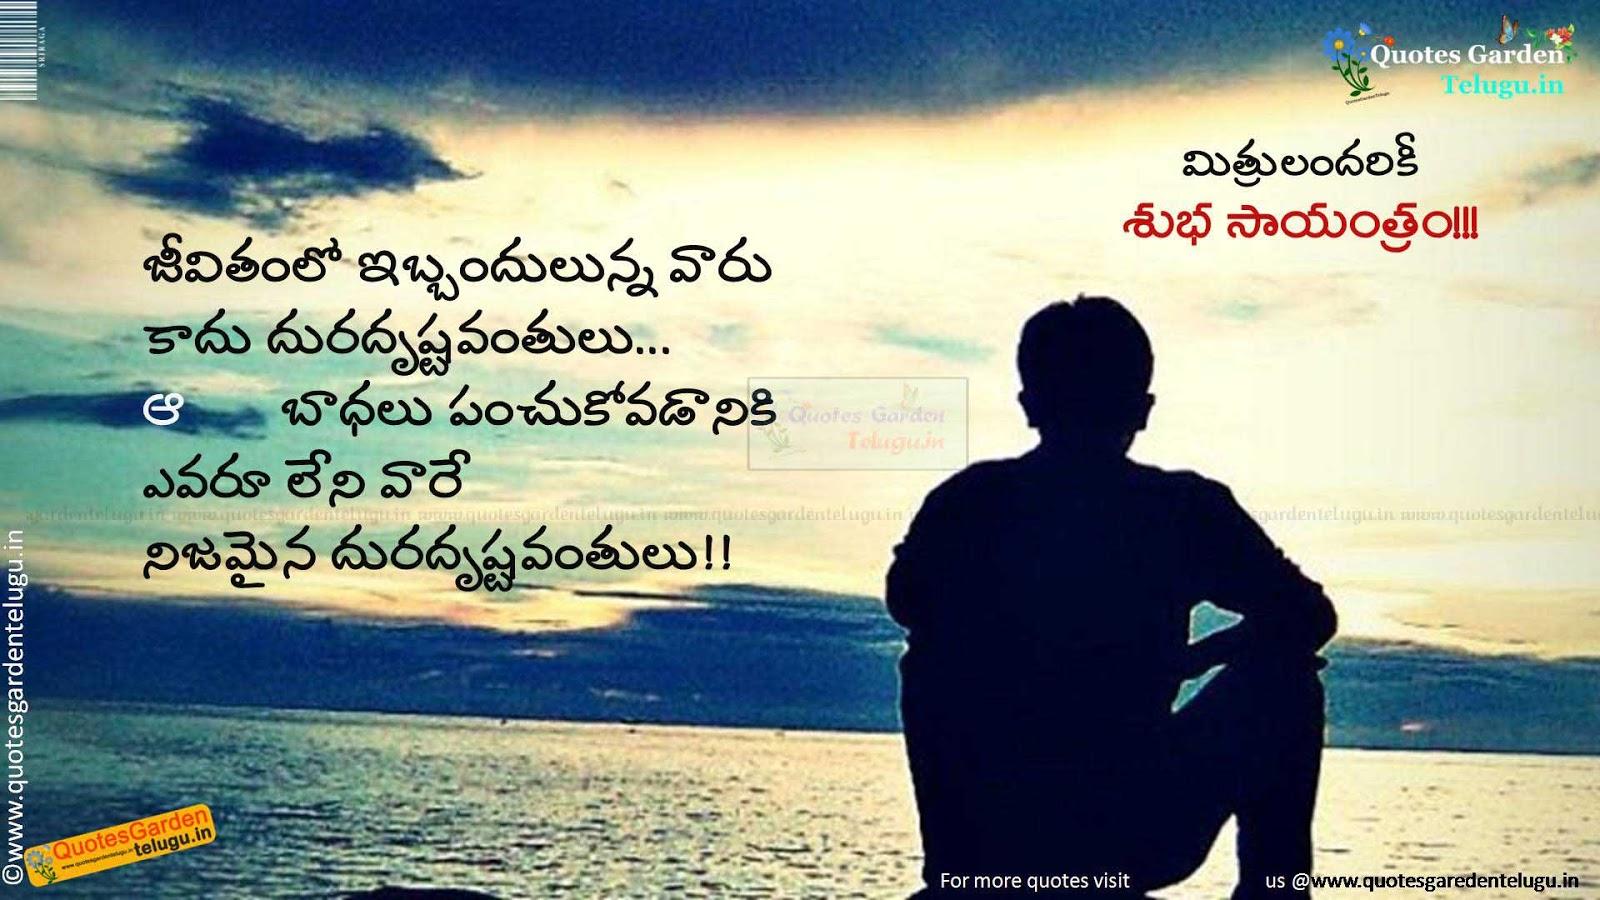 Best Good Evening Messages In Telugu Quotes Garden Telugu Telugu